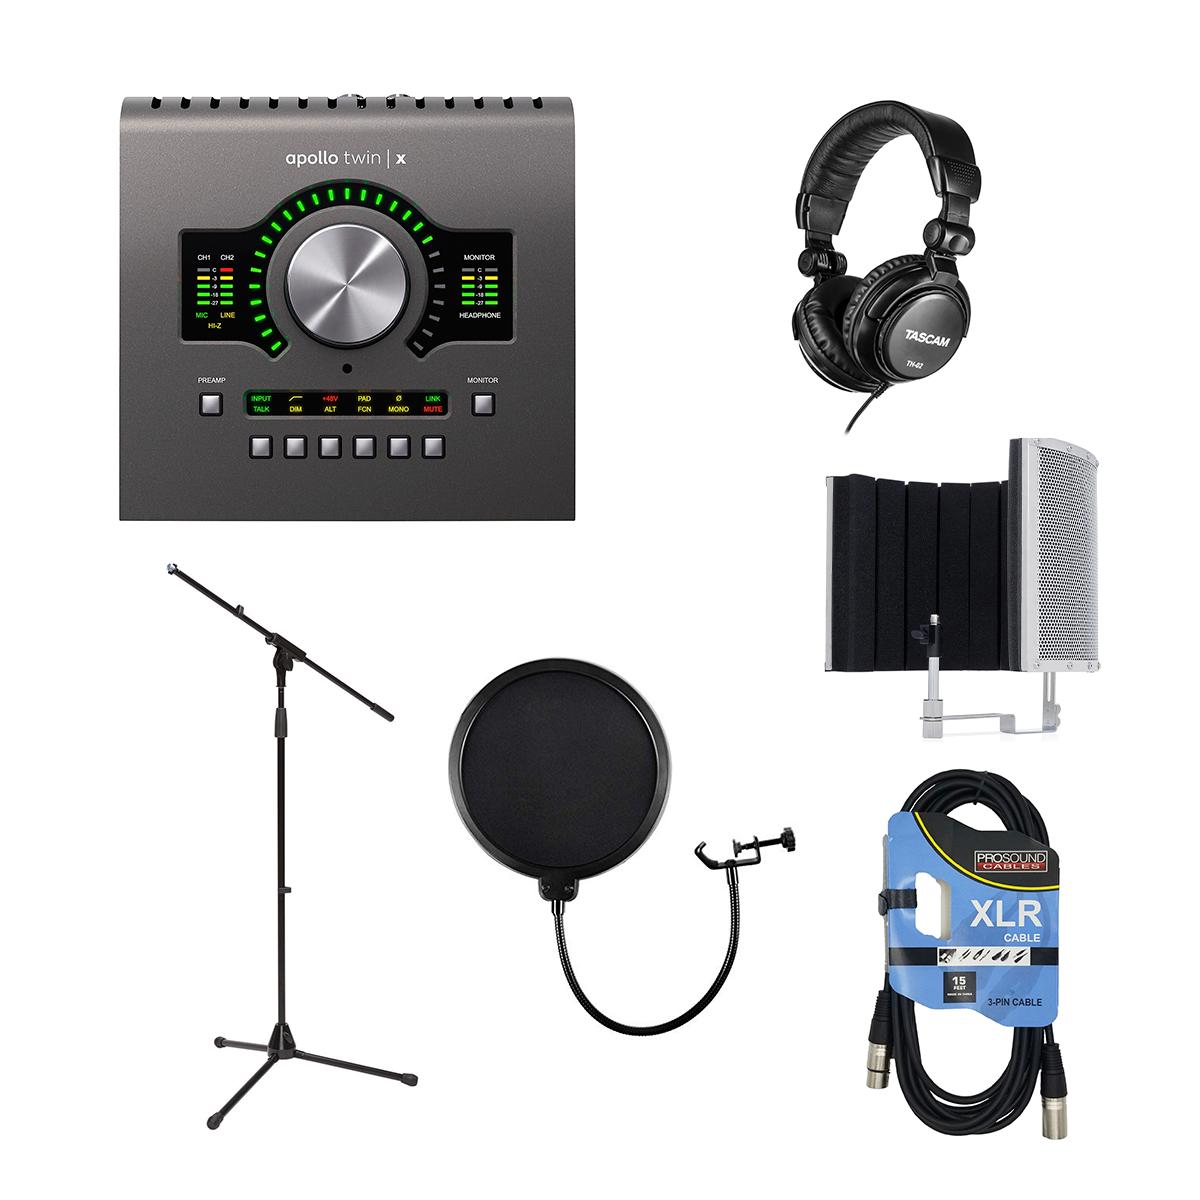 -3 Universal Audio Apollo Twin X DUO - Marantz Filter - Tascam TH02 - Mic Stand - Pop Filter - XLR Cable - $899.99